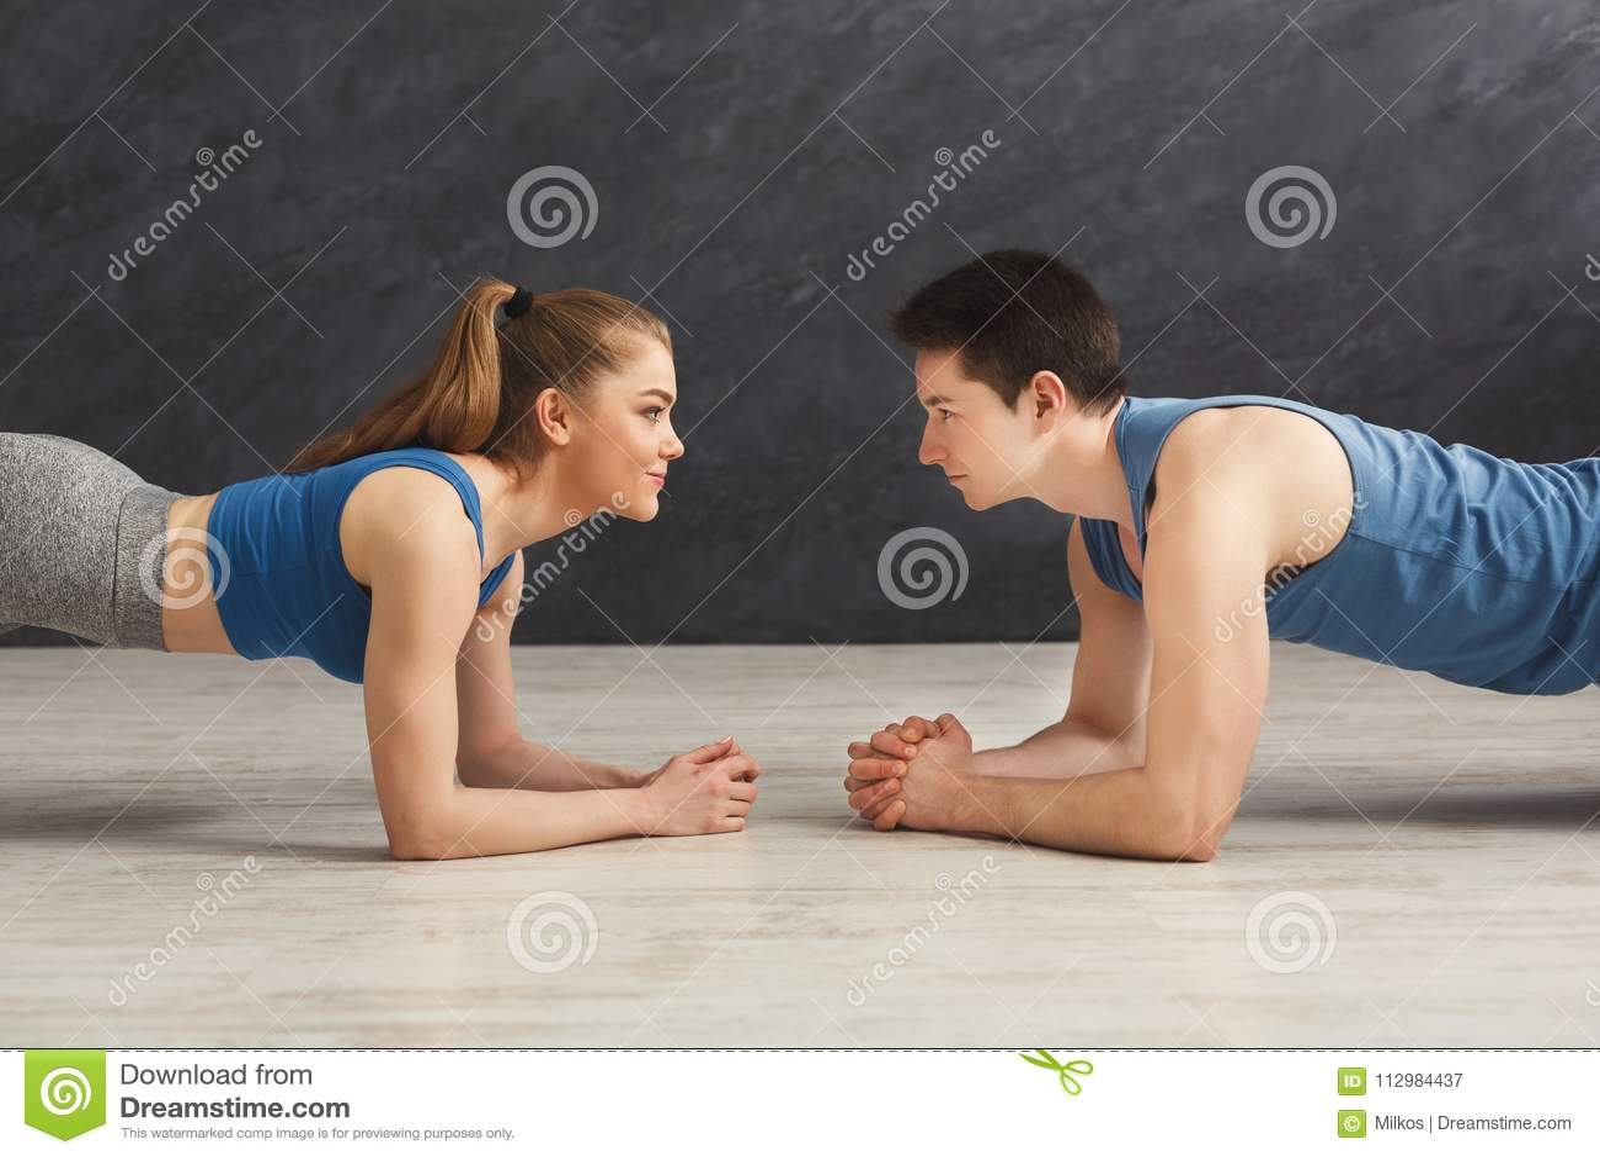 Fitness couple plank training indoors